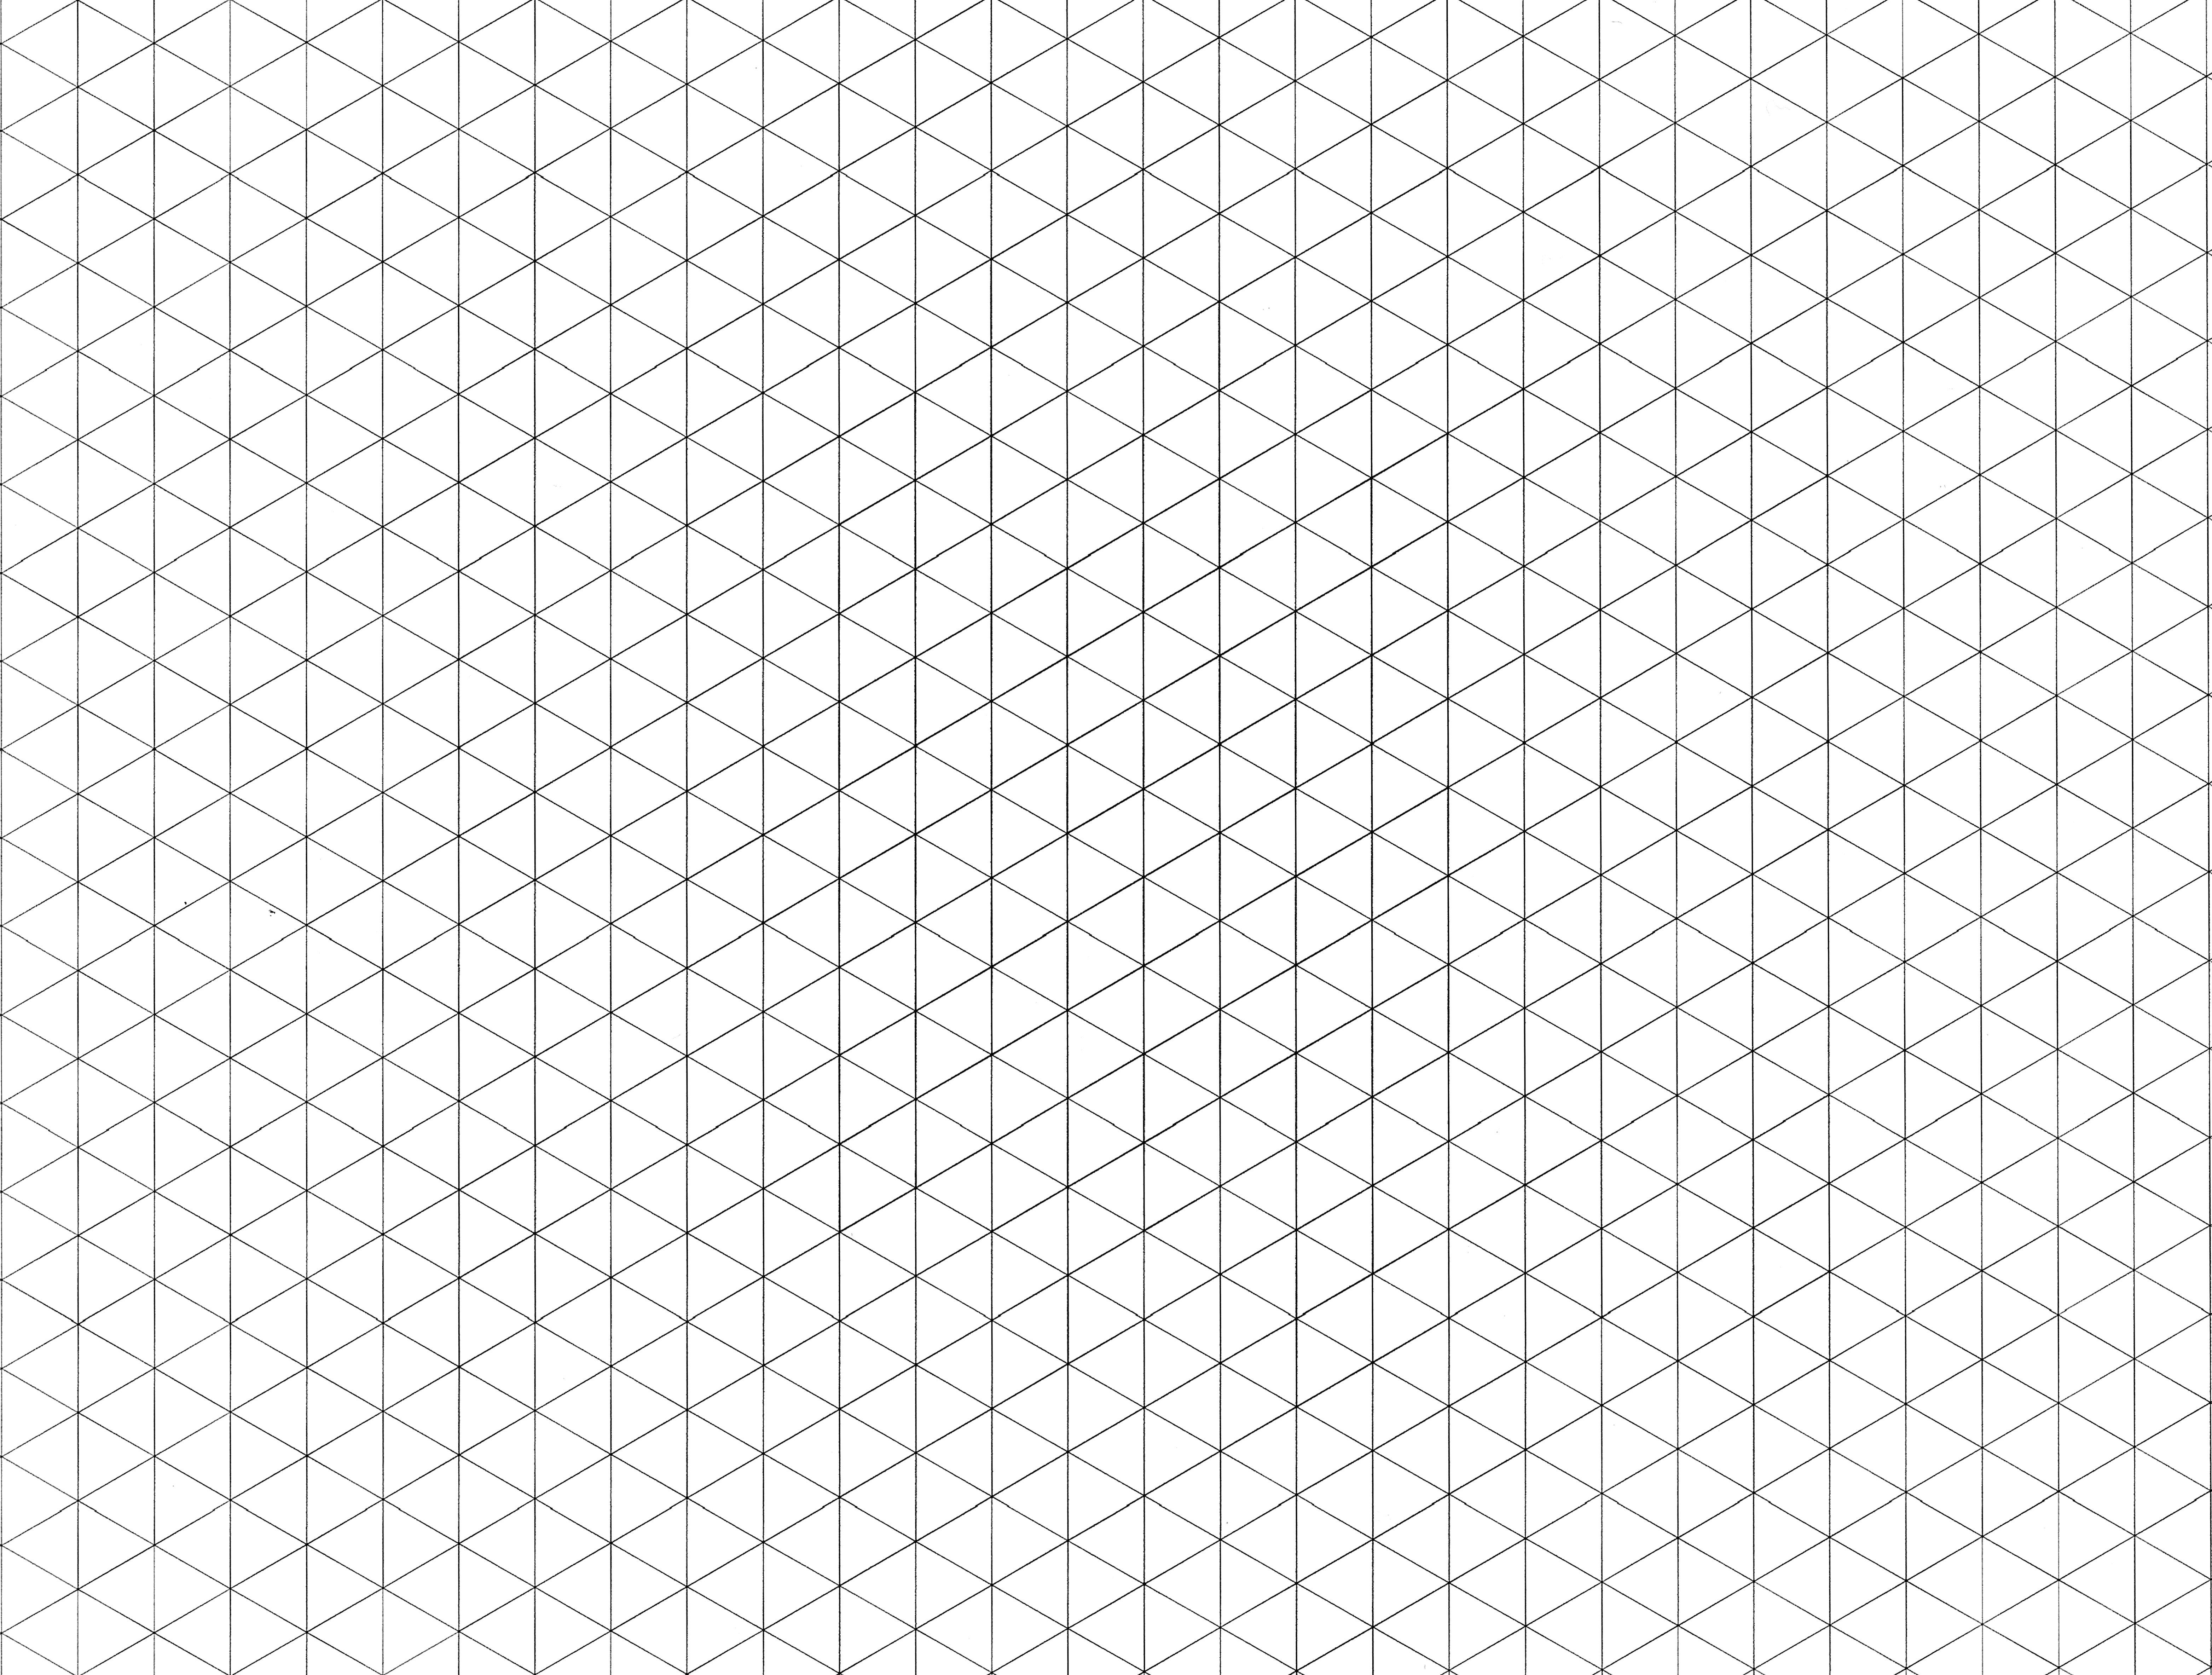 Isometric Grid Paper Drawings